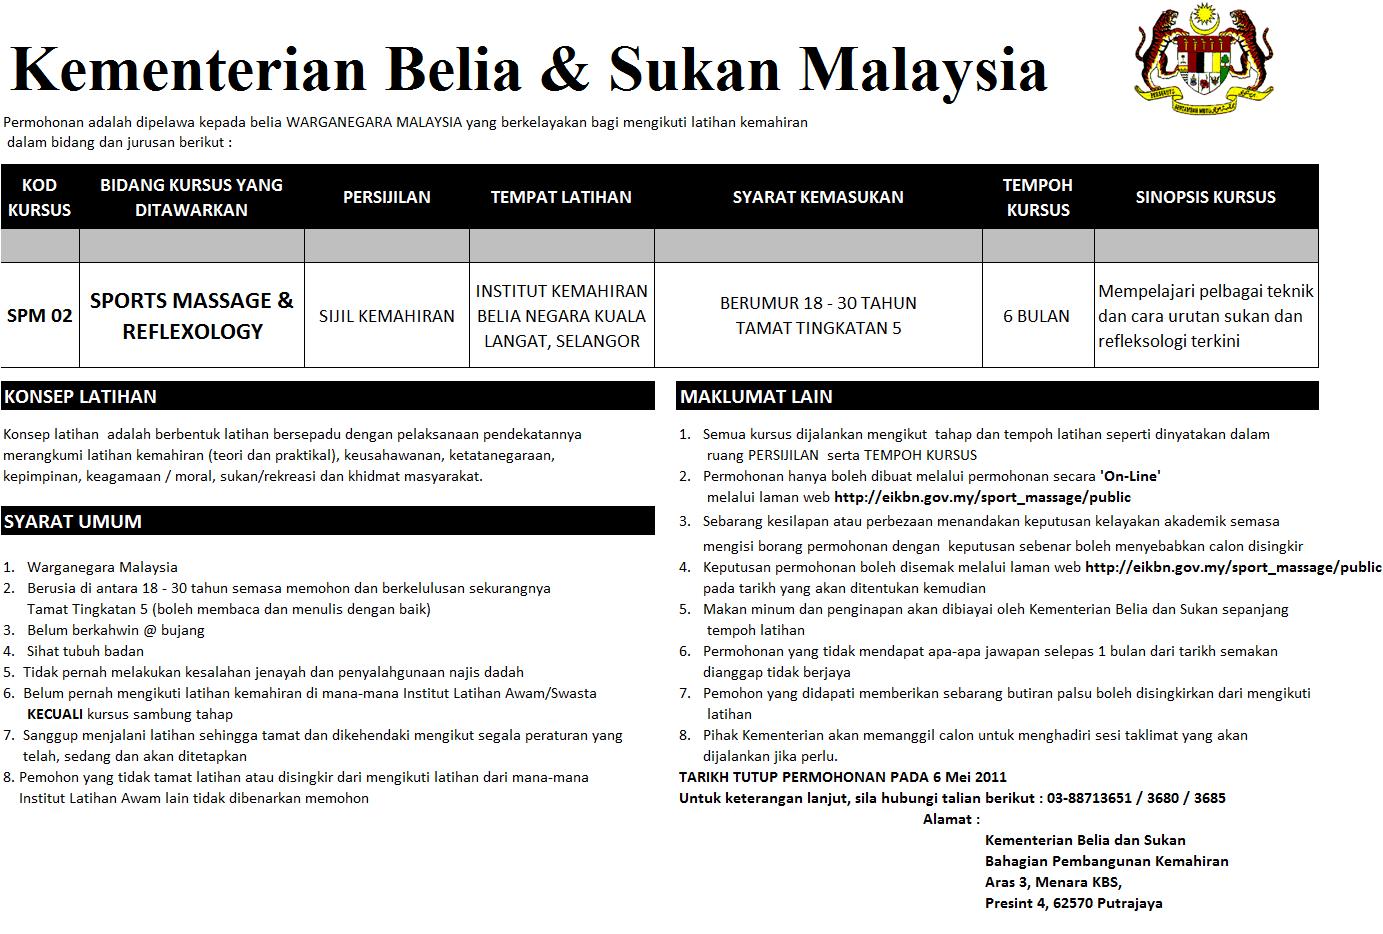 Kementerian belia dan sukan malaysia kursus sport massage reflexology